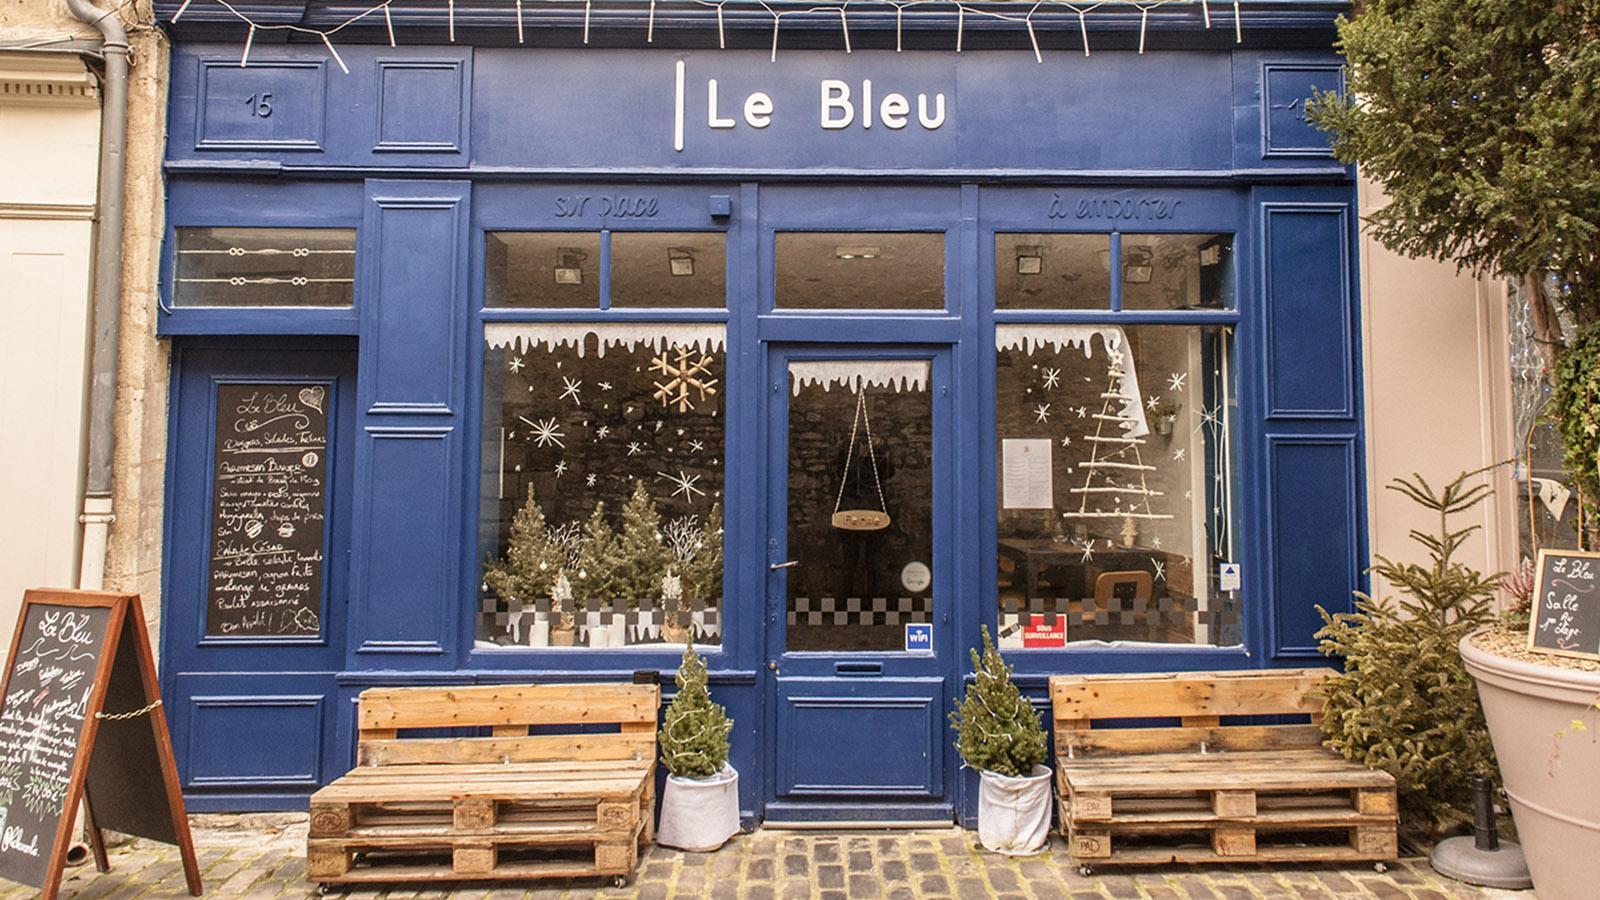 Hotspot der Szenegänger von Senlis: Le Bleu. Foto: Hilke Maunder